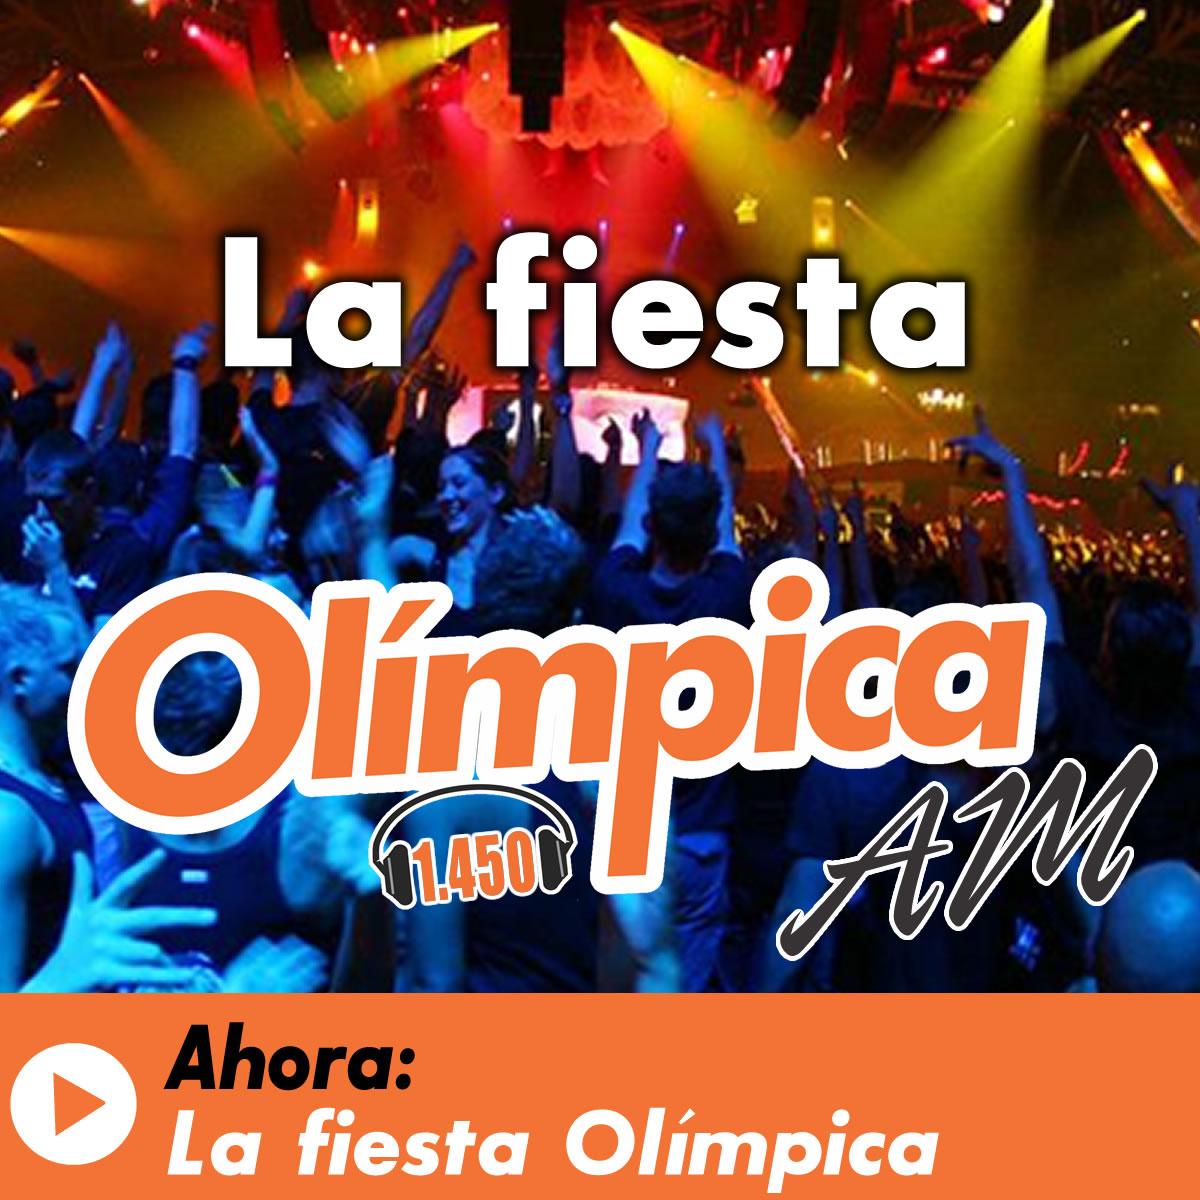 La fiesta Olímpica